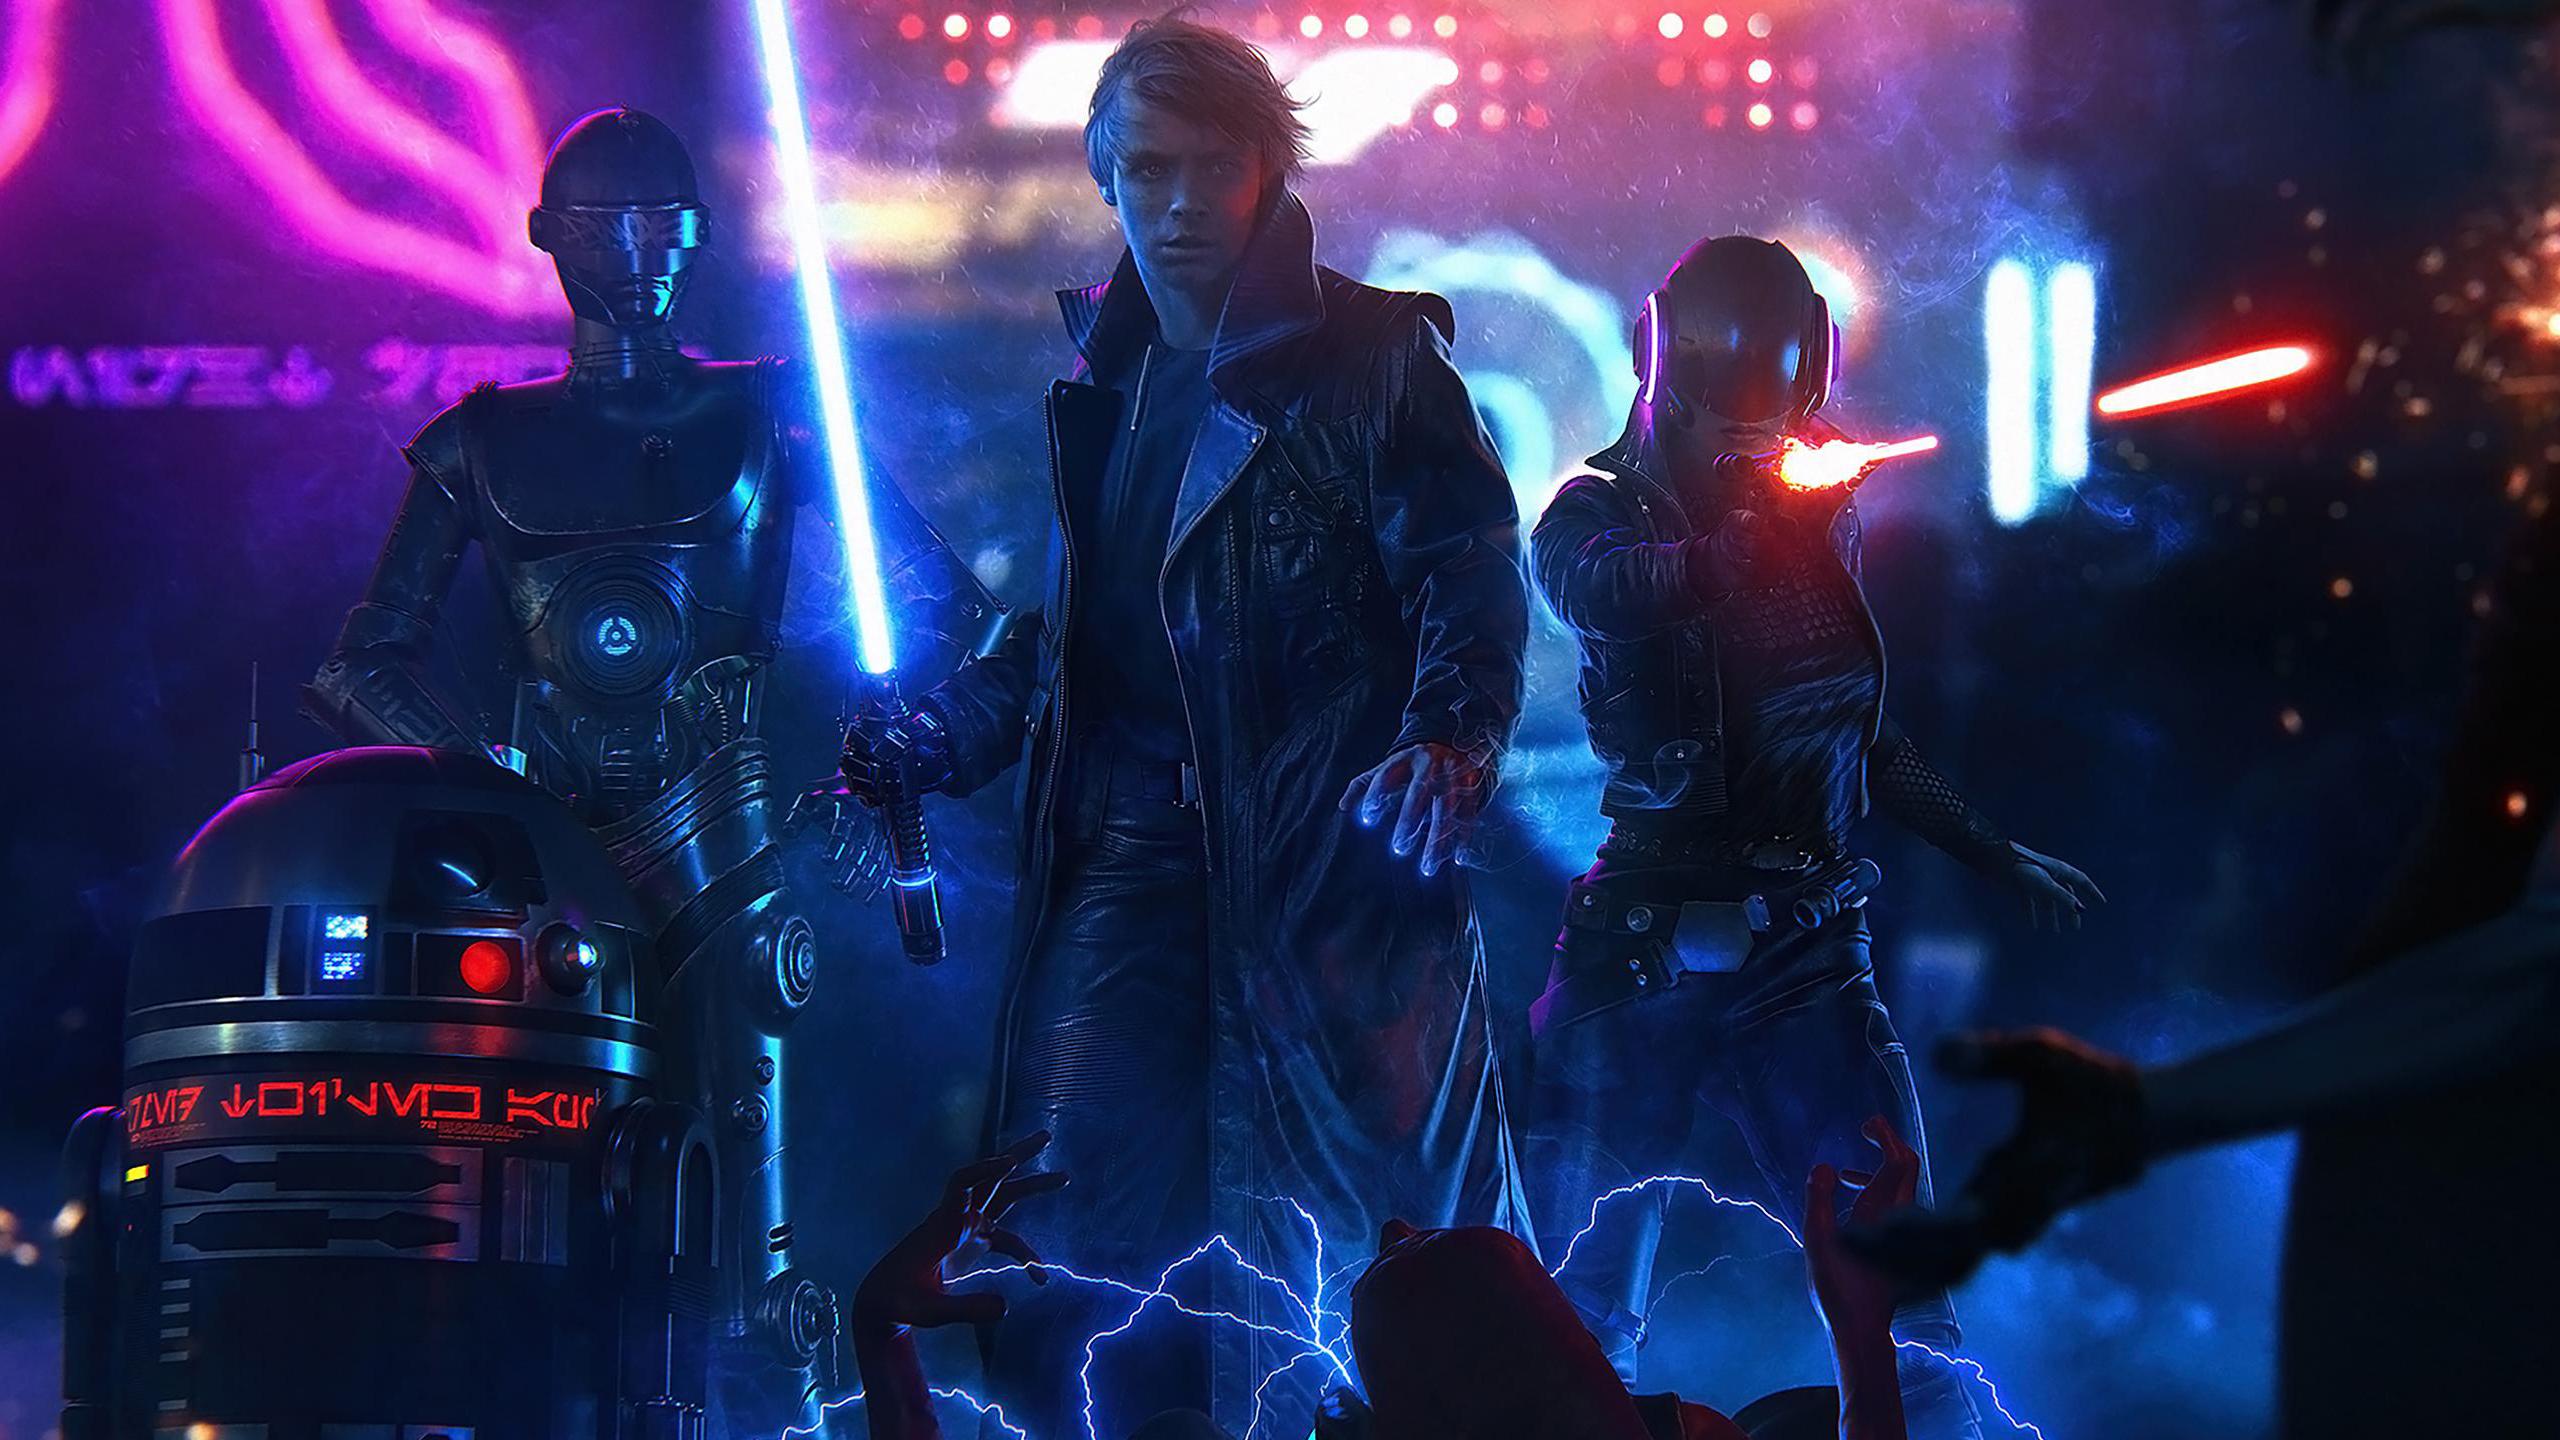 Star Wars neon lightsaber 1585001